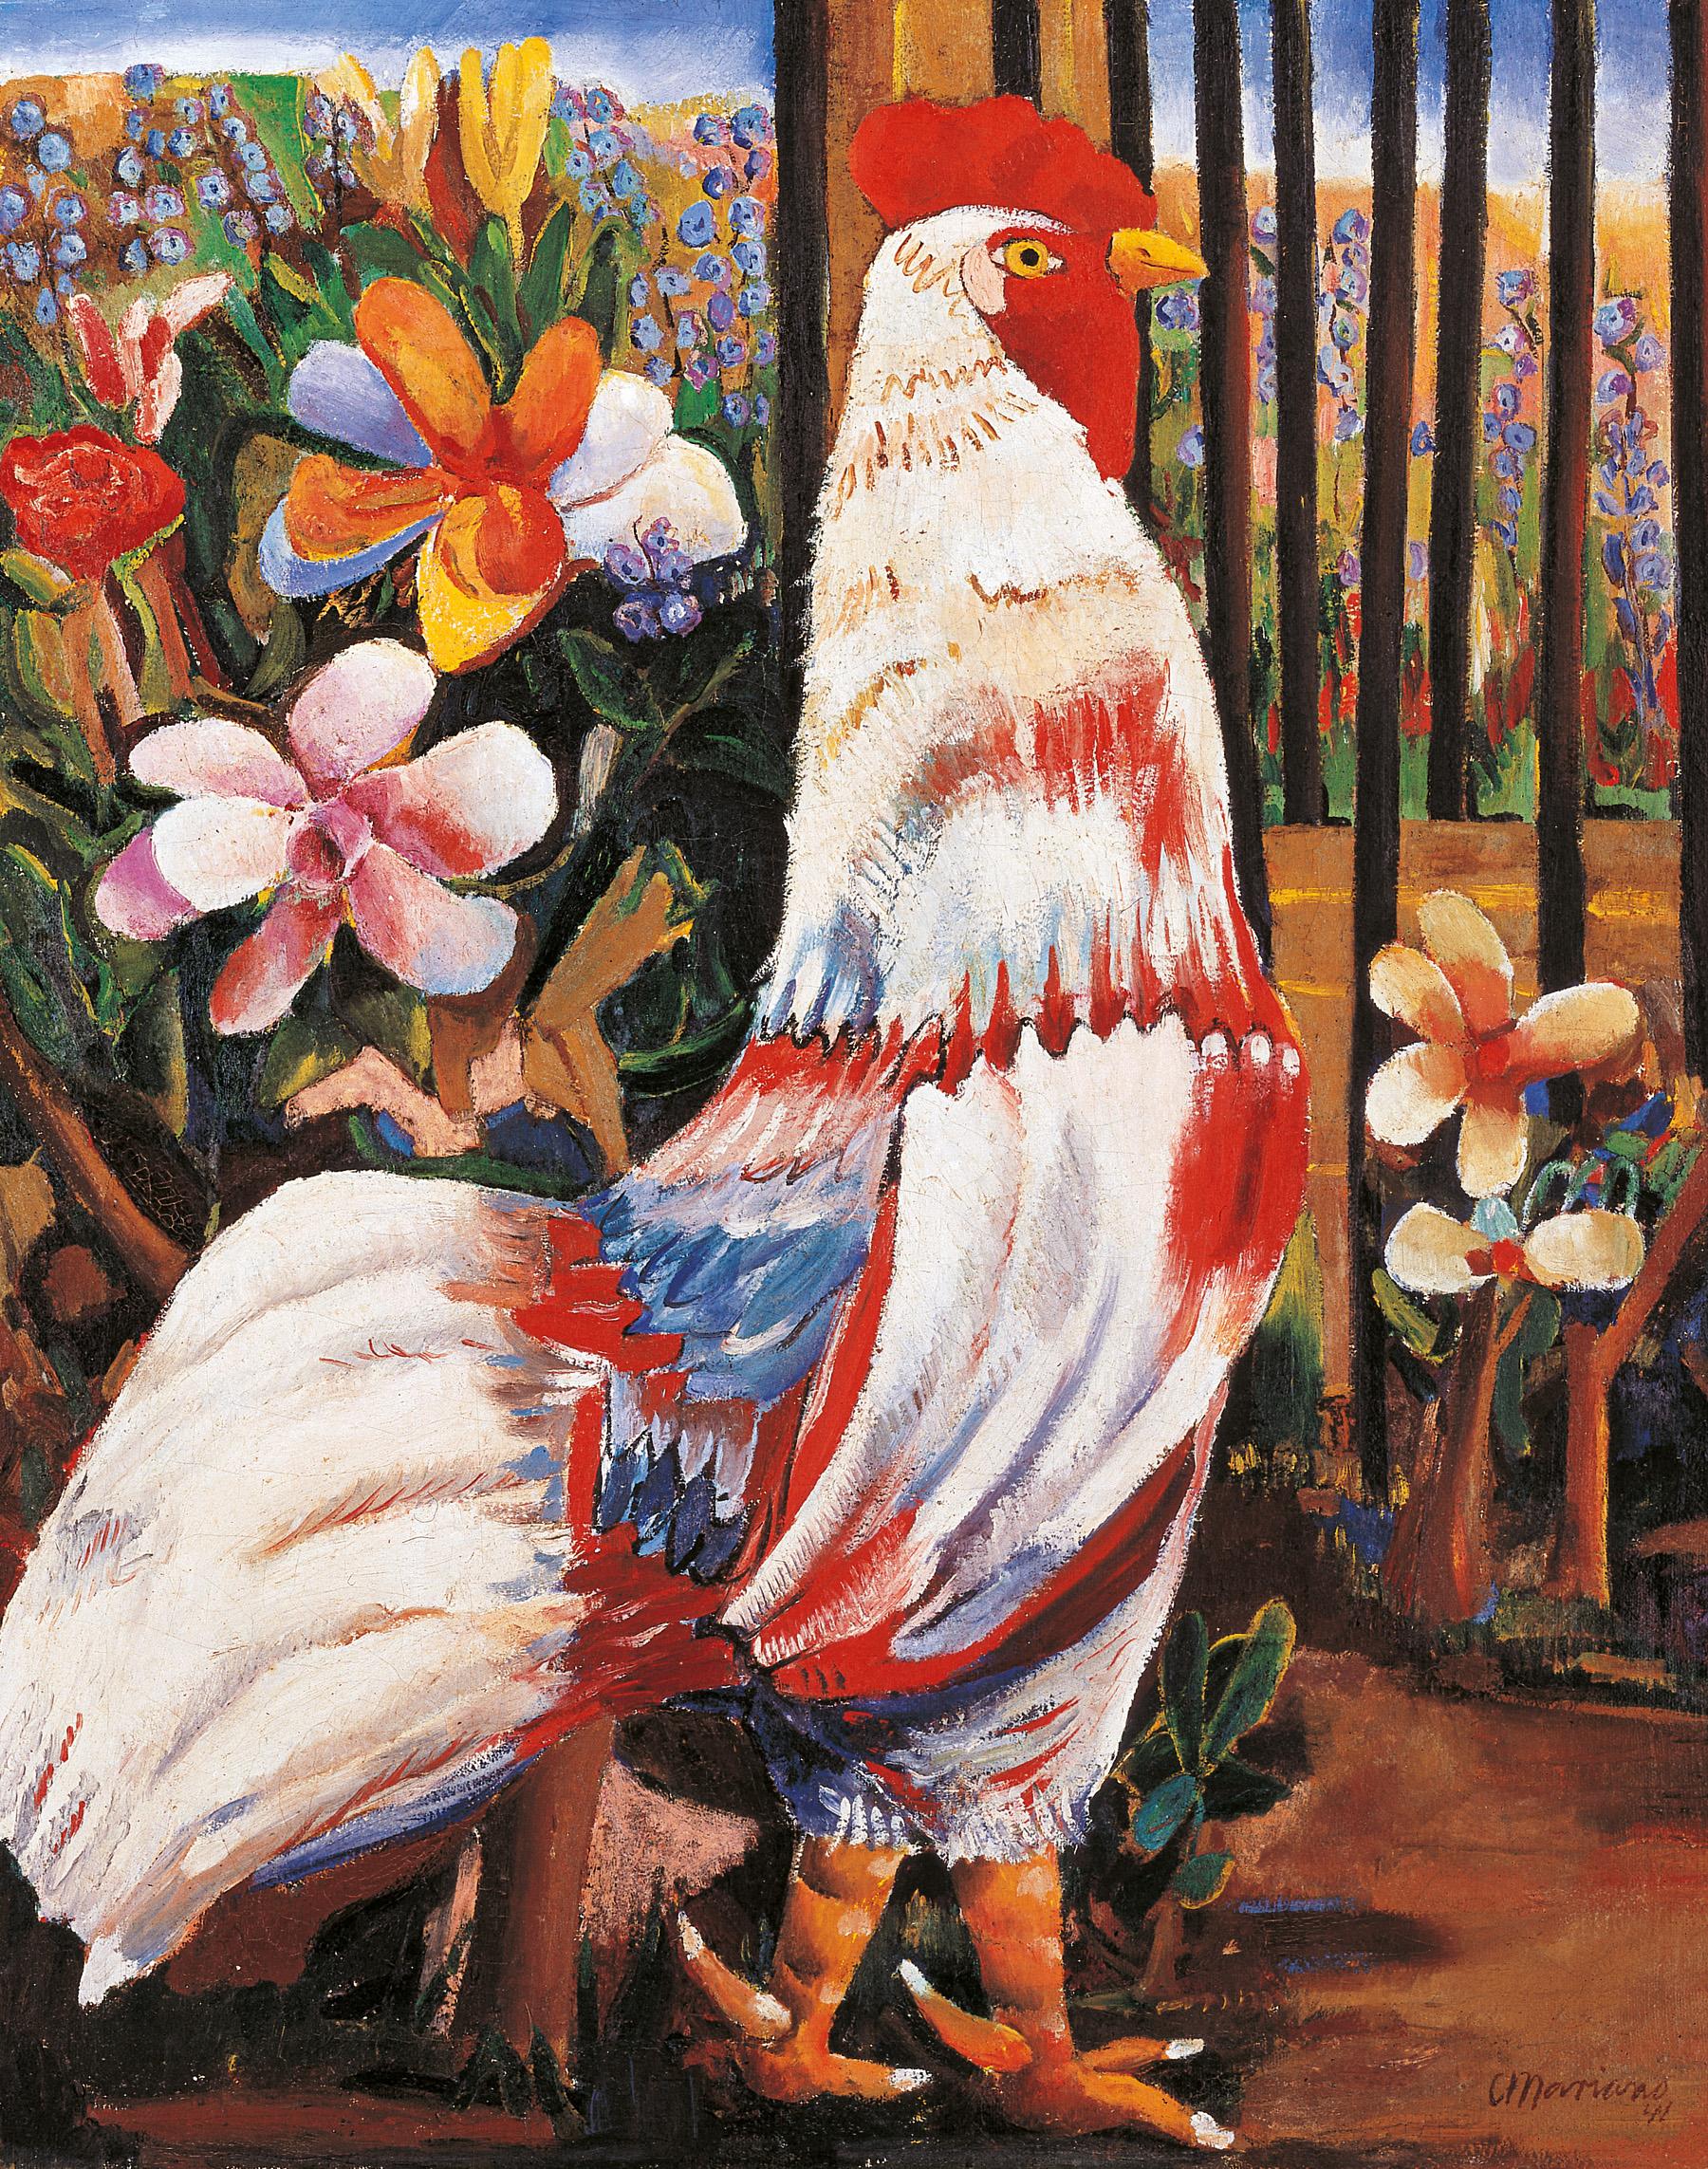 Cuban artist Mariano Rodriguez